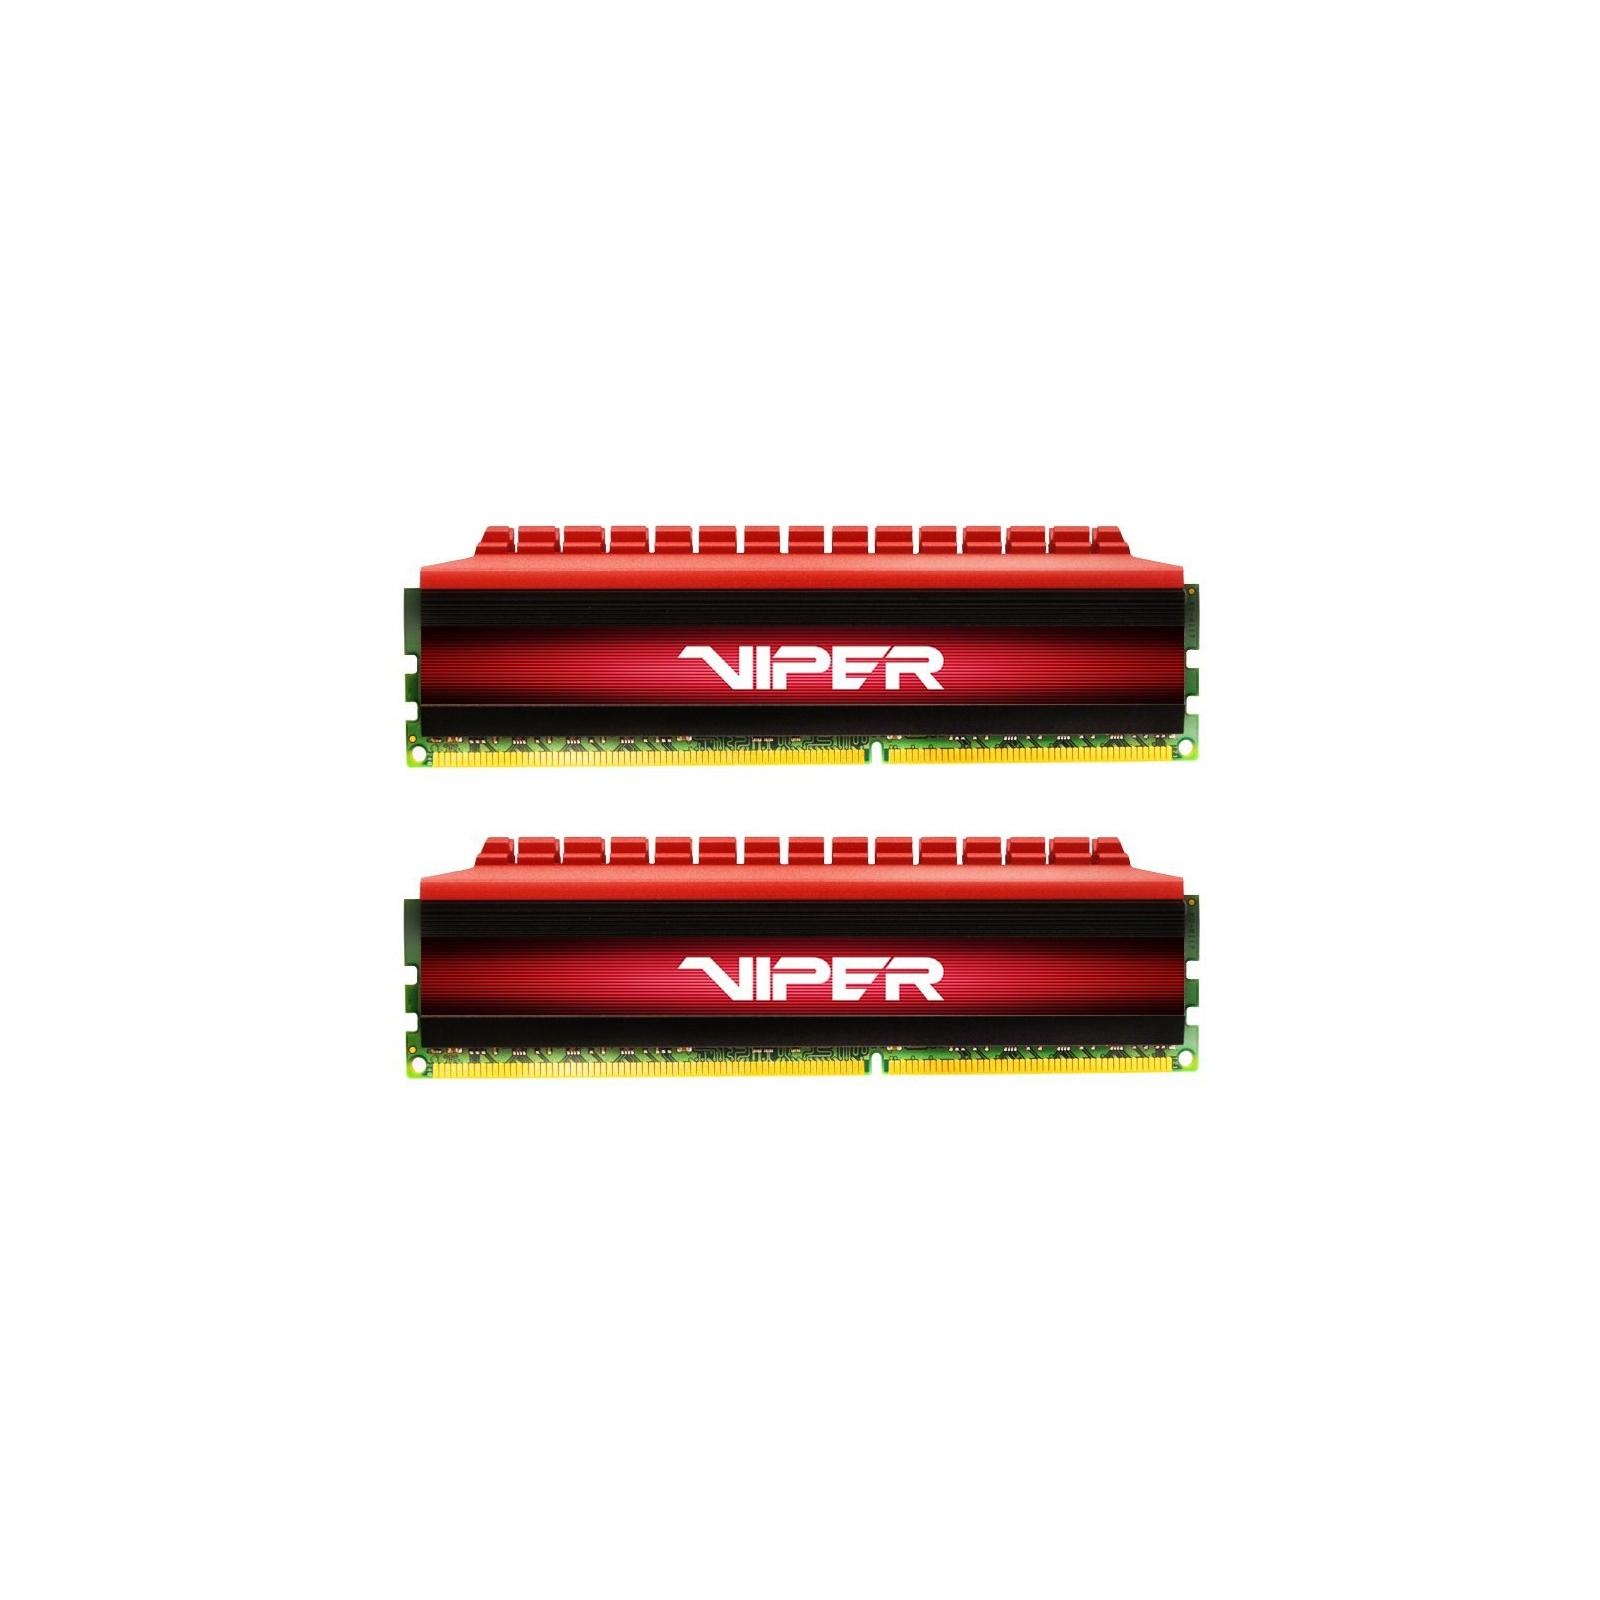 Модуль памяти для компьютера DDR4 16GB (2x8GB) 2400 MHz PE-V4 BLK/RED DUALCH Patriot (PV416G240C5K)